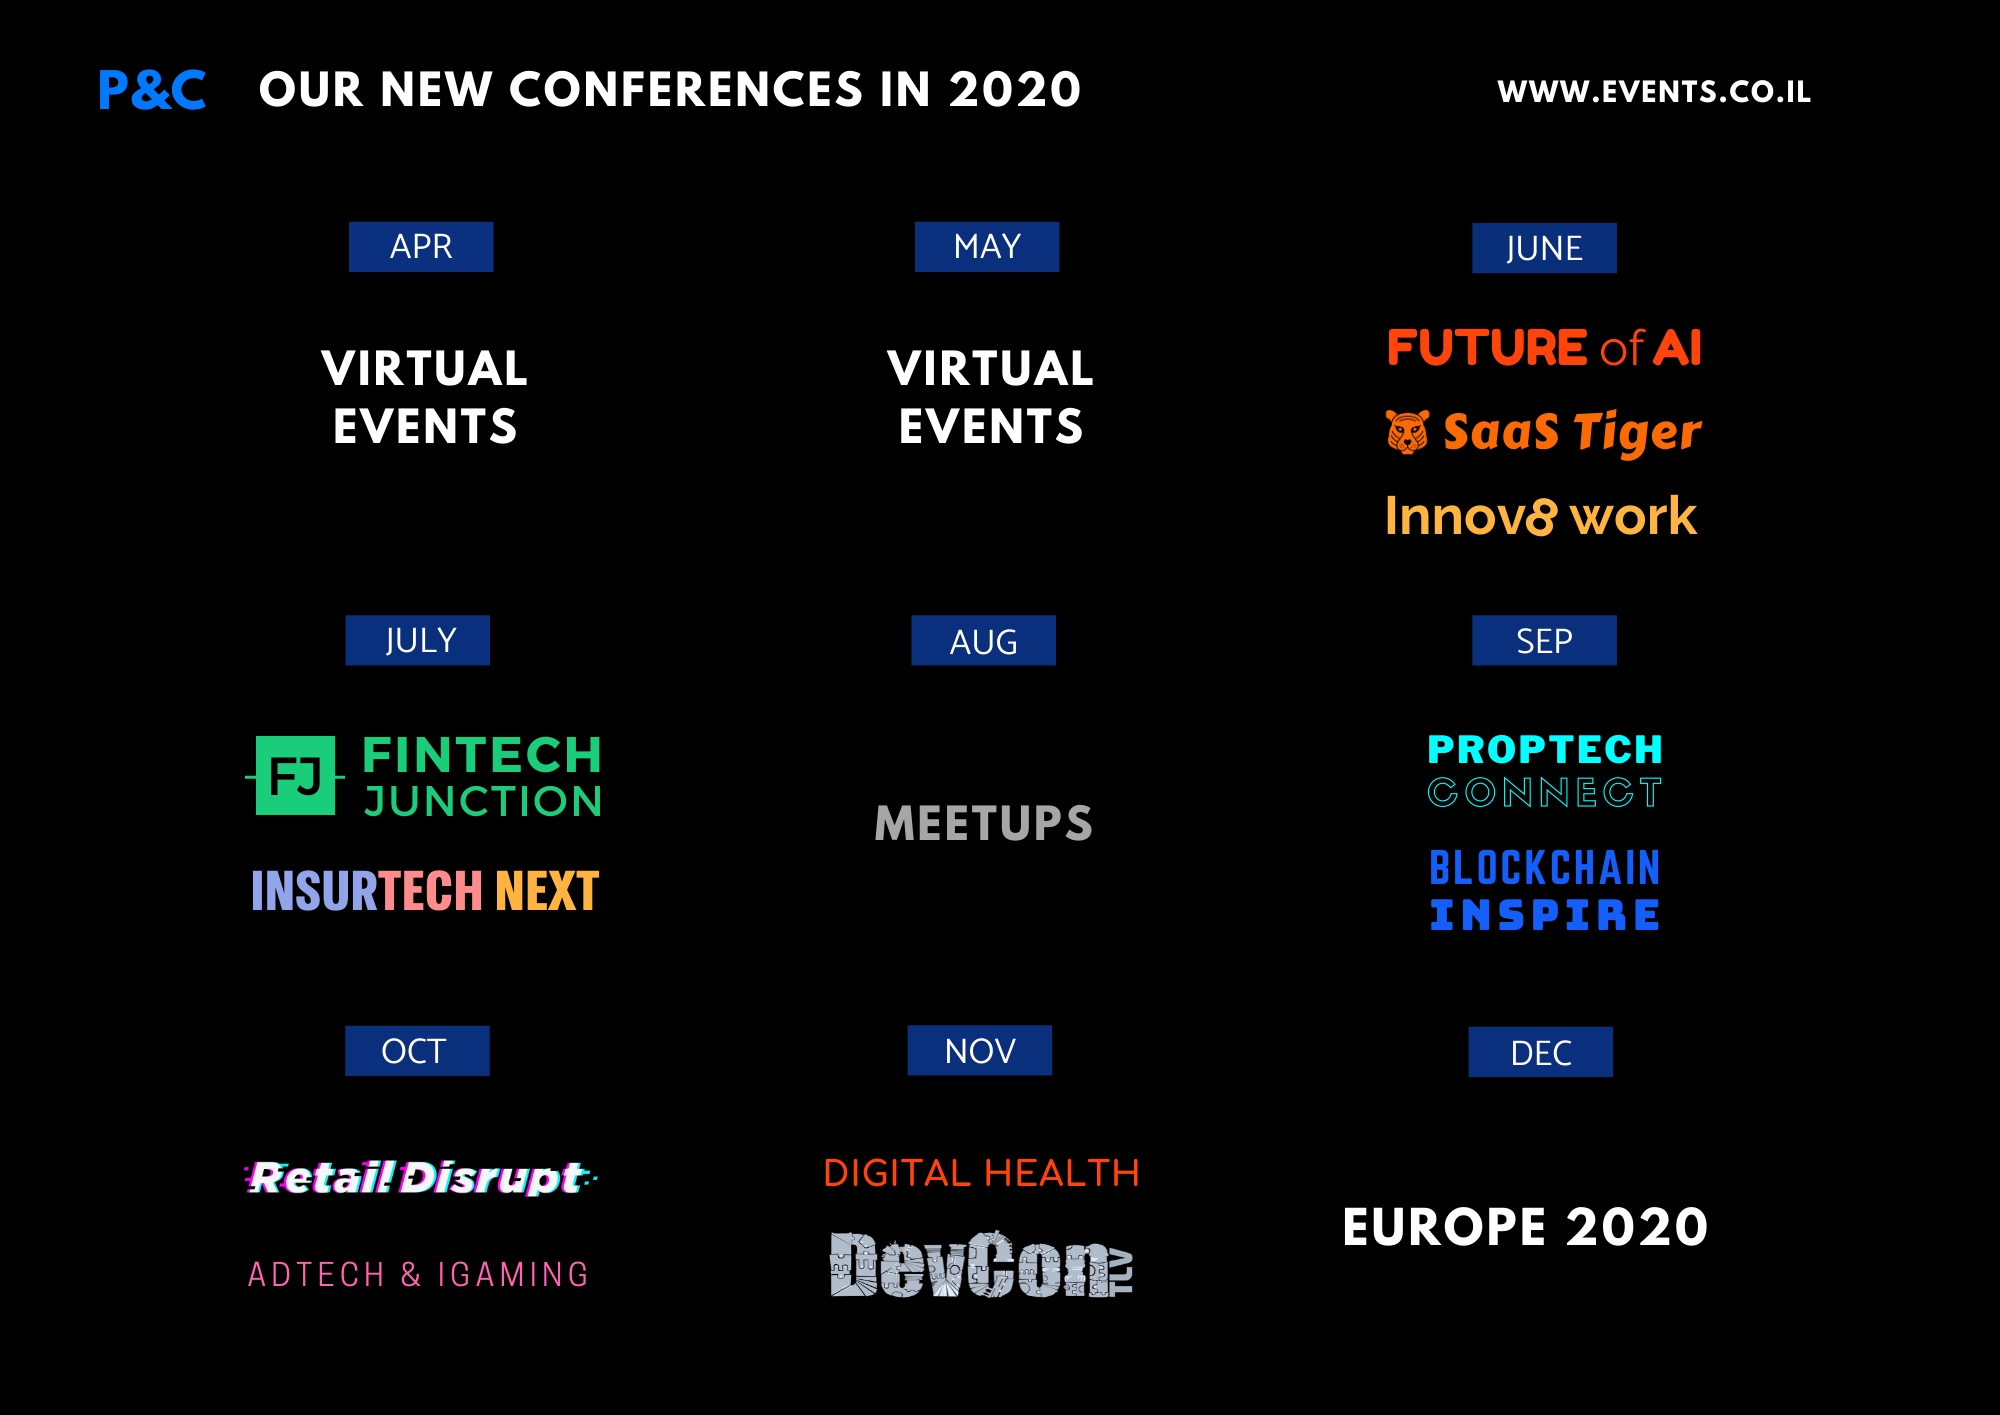 Event plan 2020